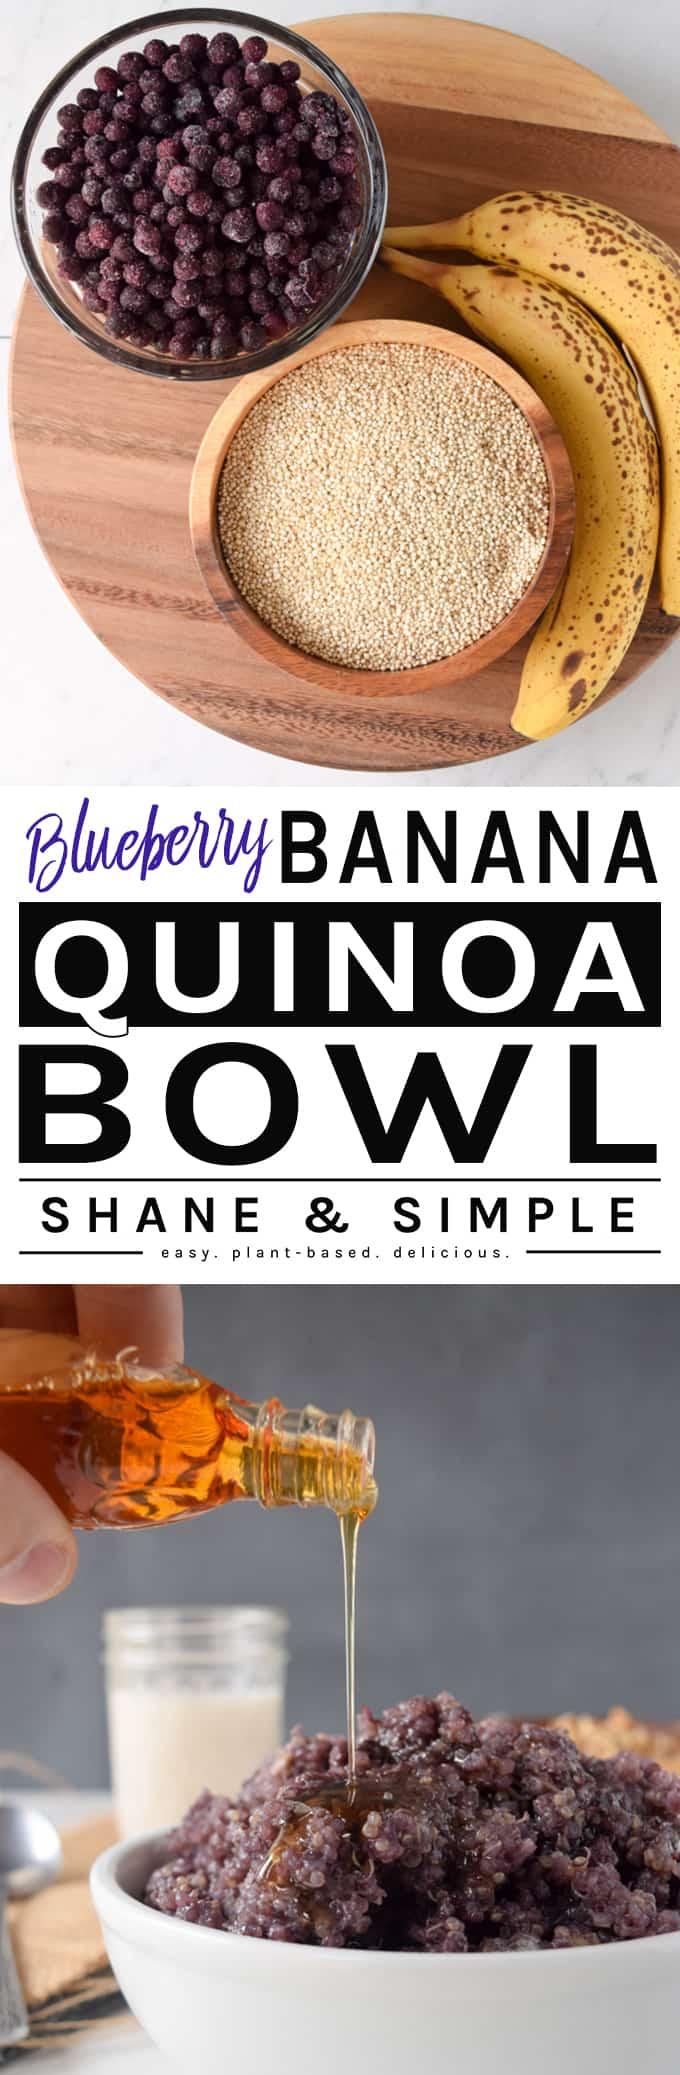 Blueberry Banana Quinoa Bowl | https://shaneandsimple.com/blueberry-banana-quinoa-bowl/